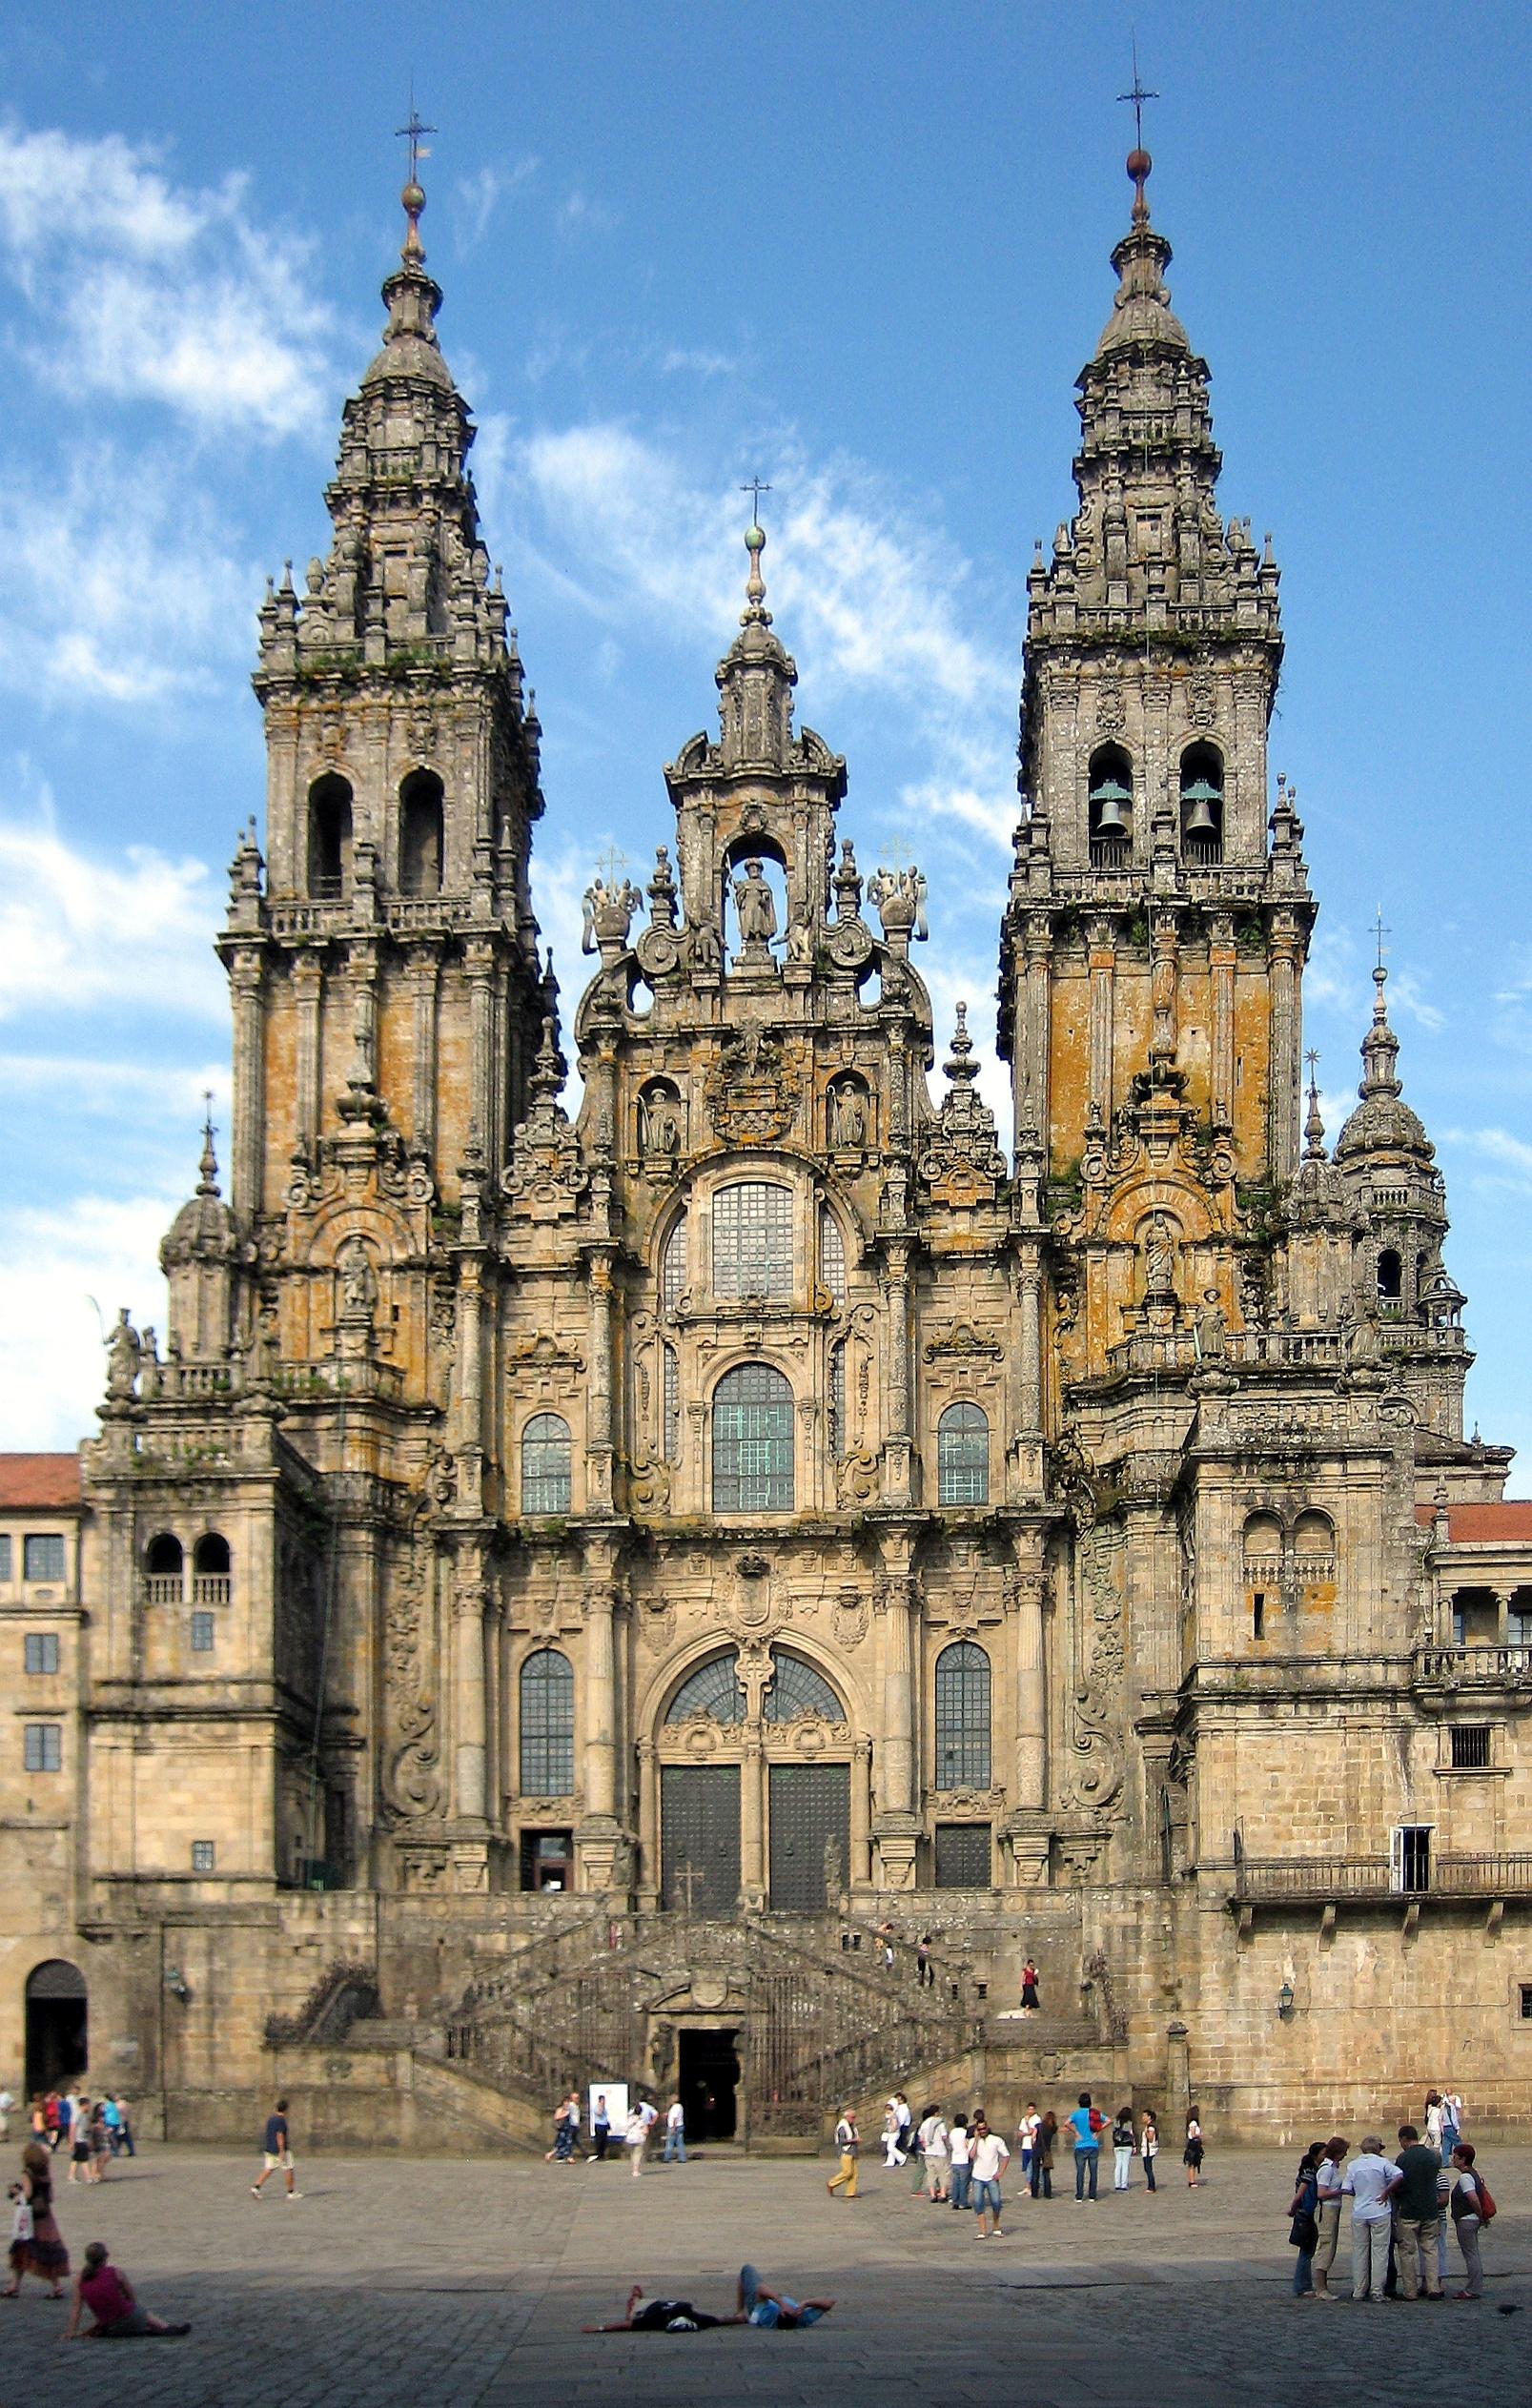 File:Catedral de Santiago de Compostela 2010.jpg - Wikimedia Commons